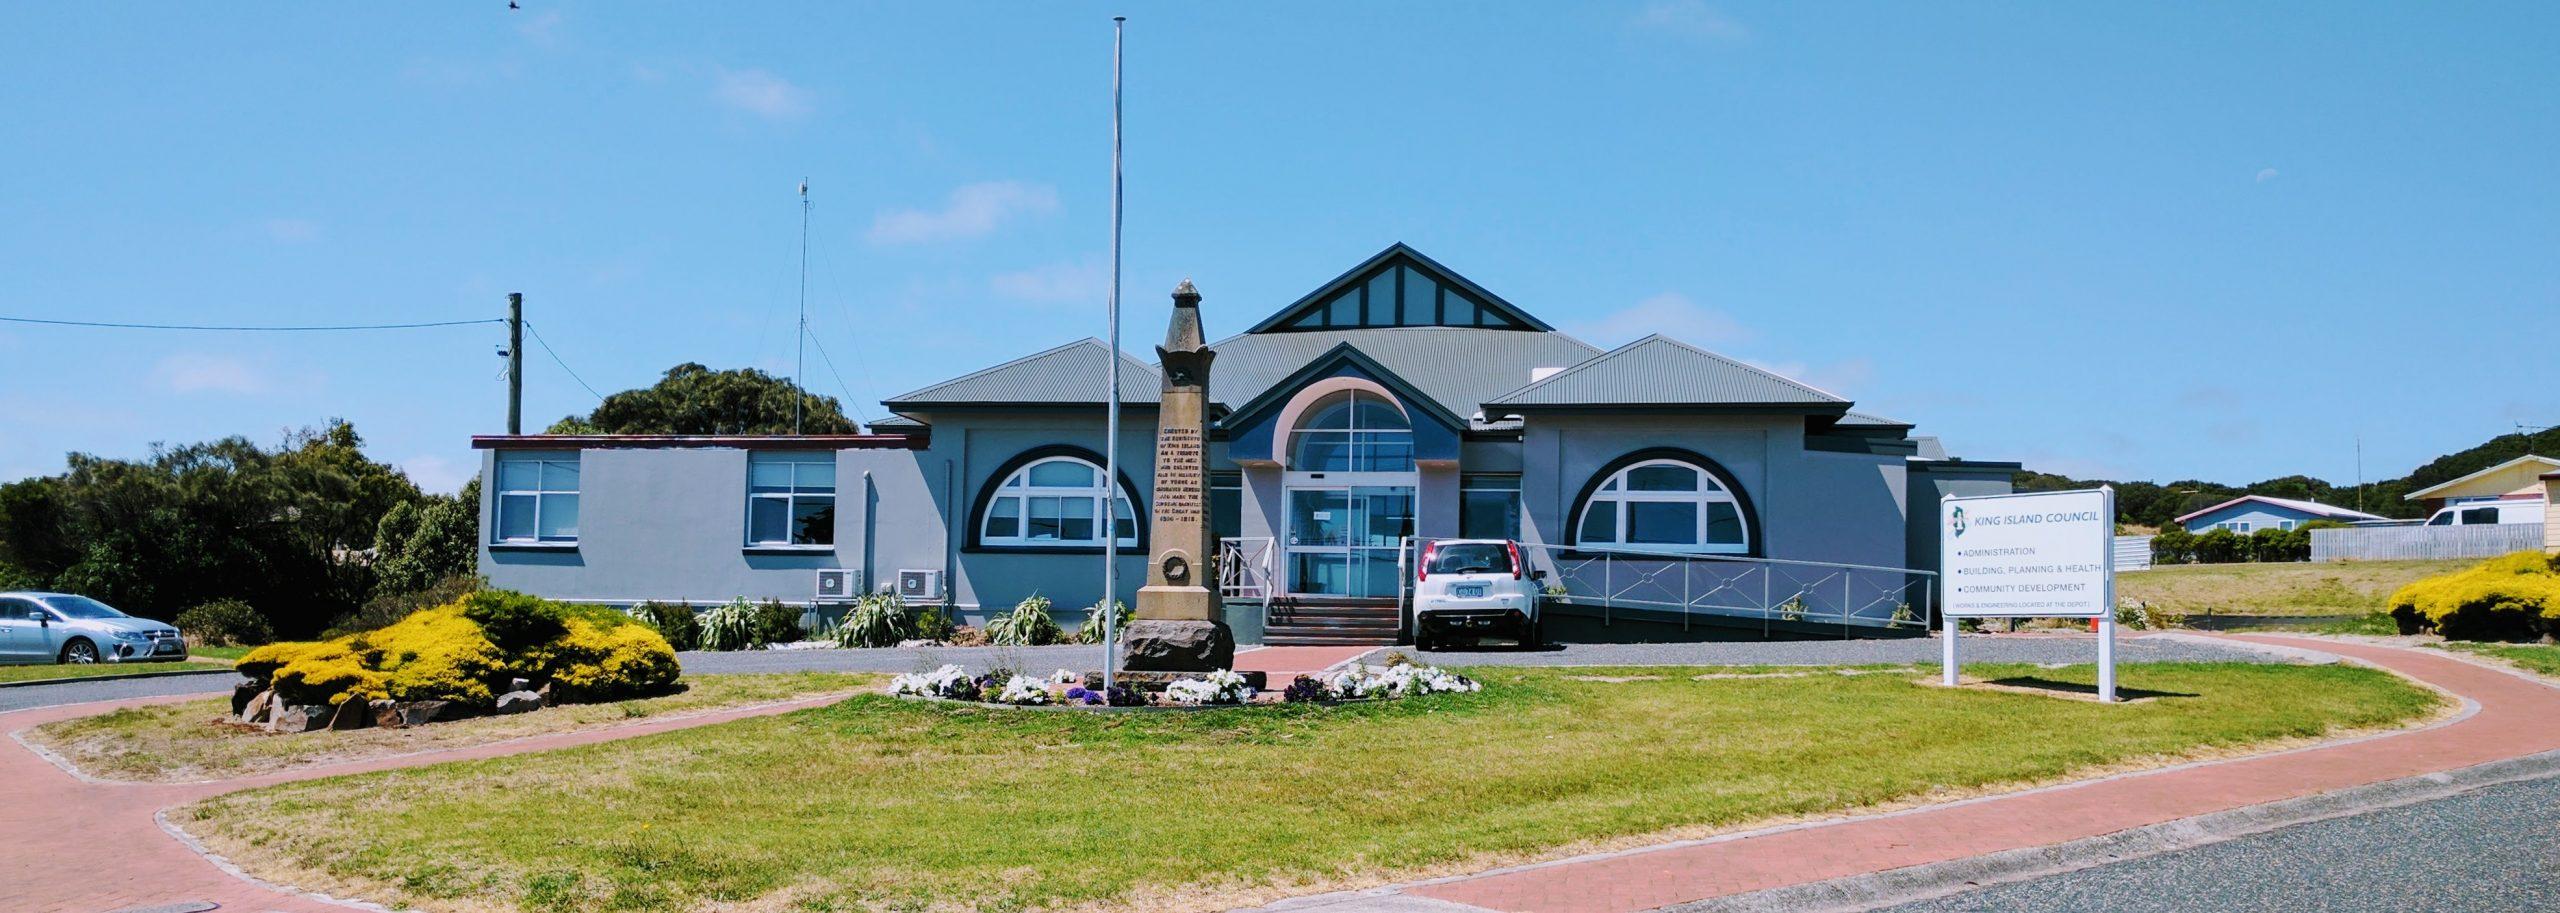 King Island Council Chambers